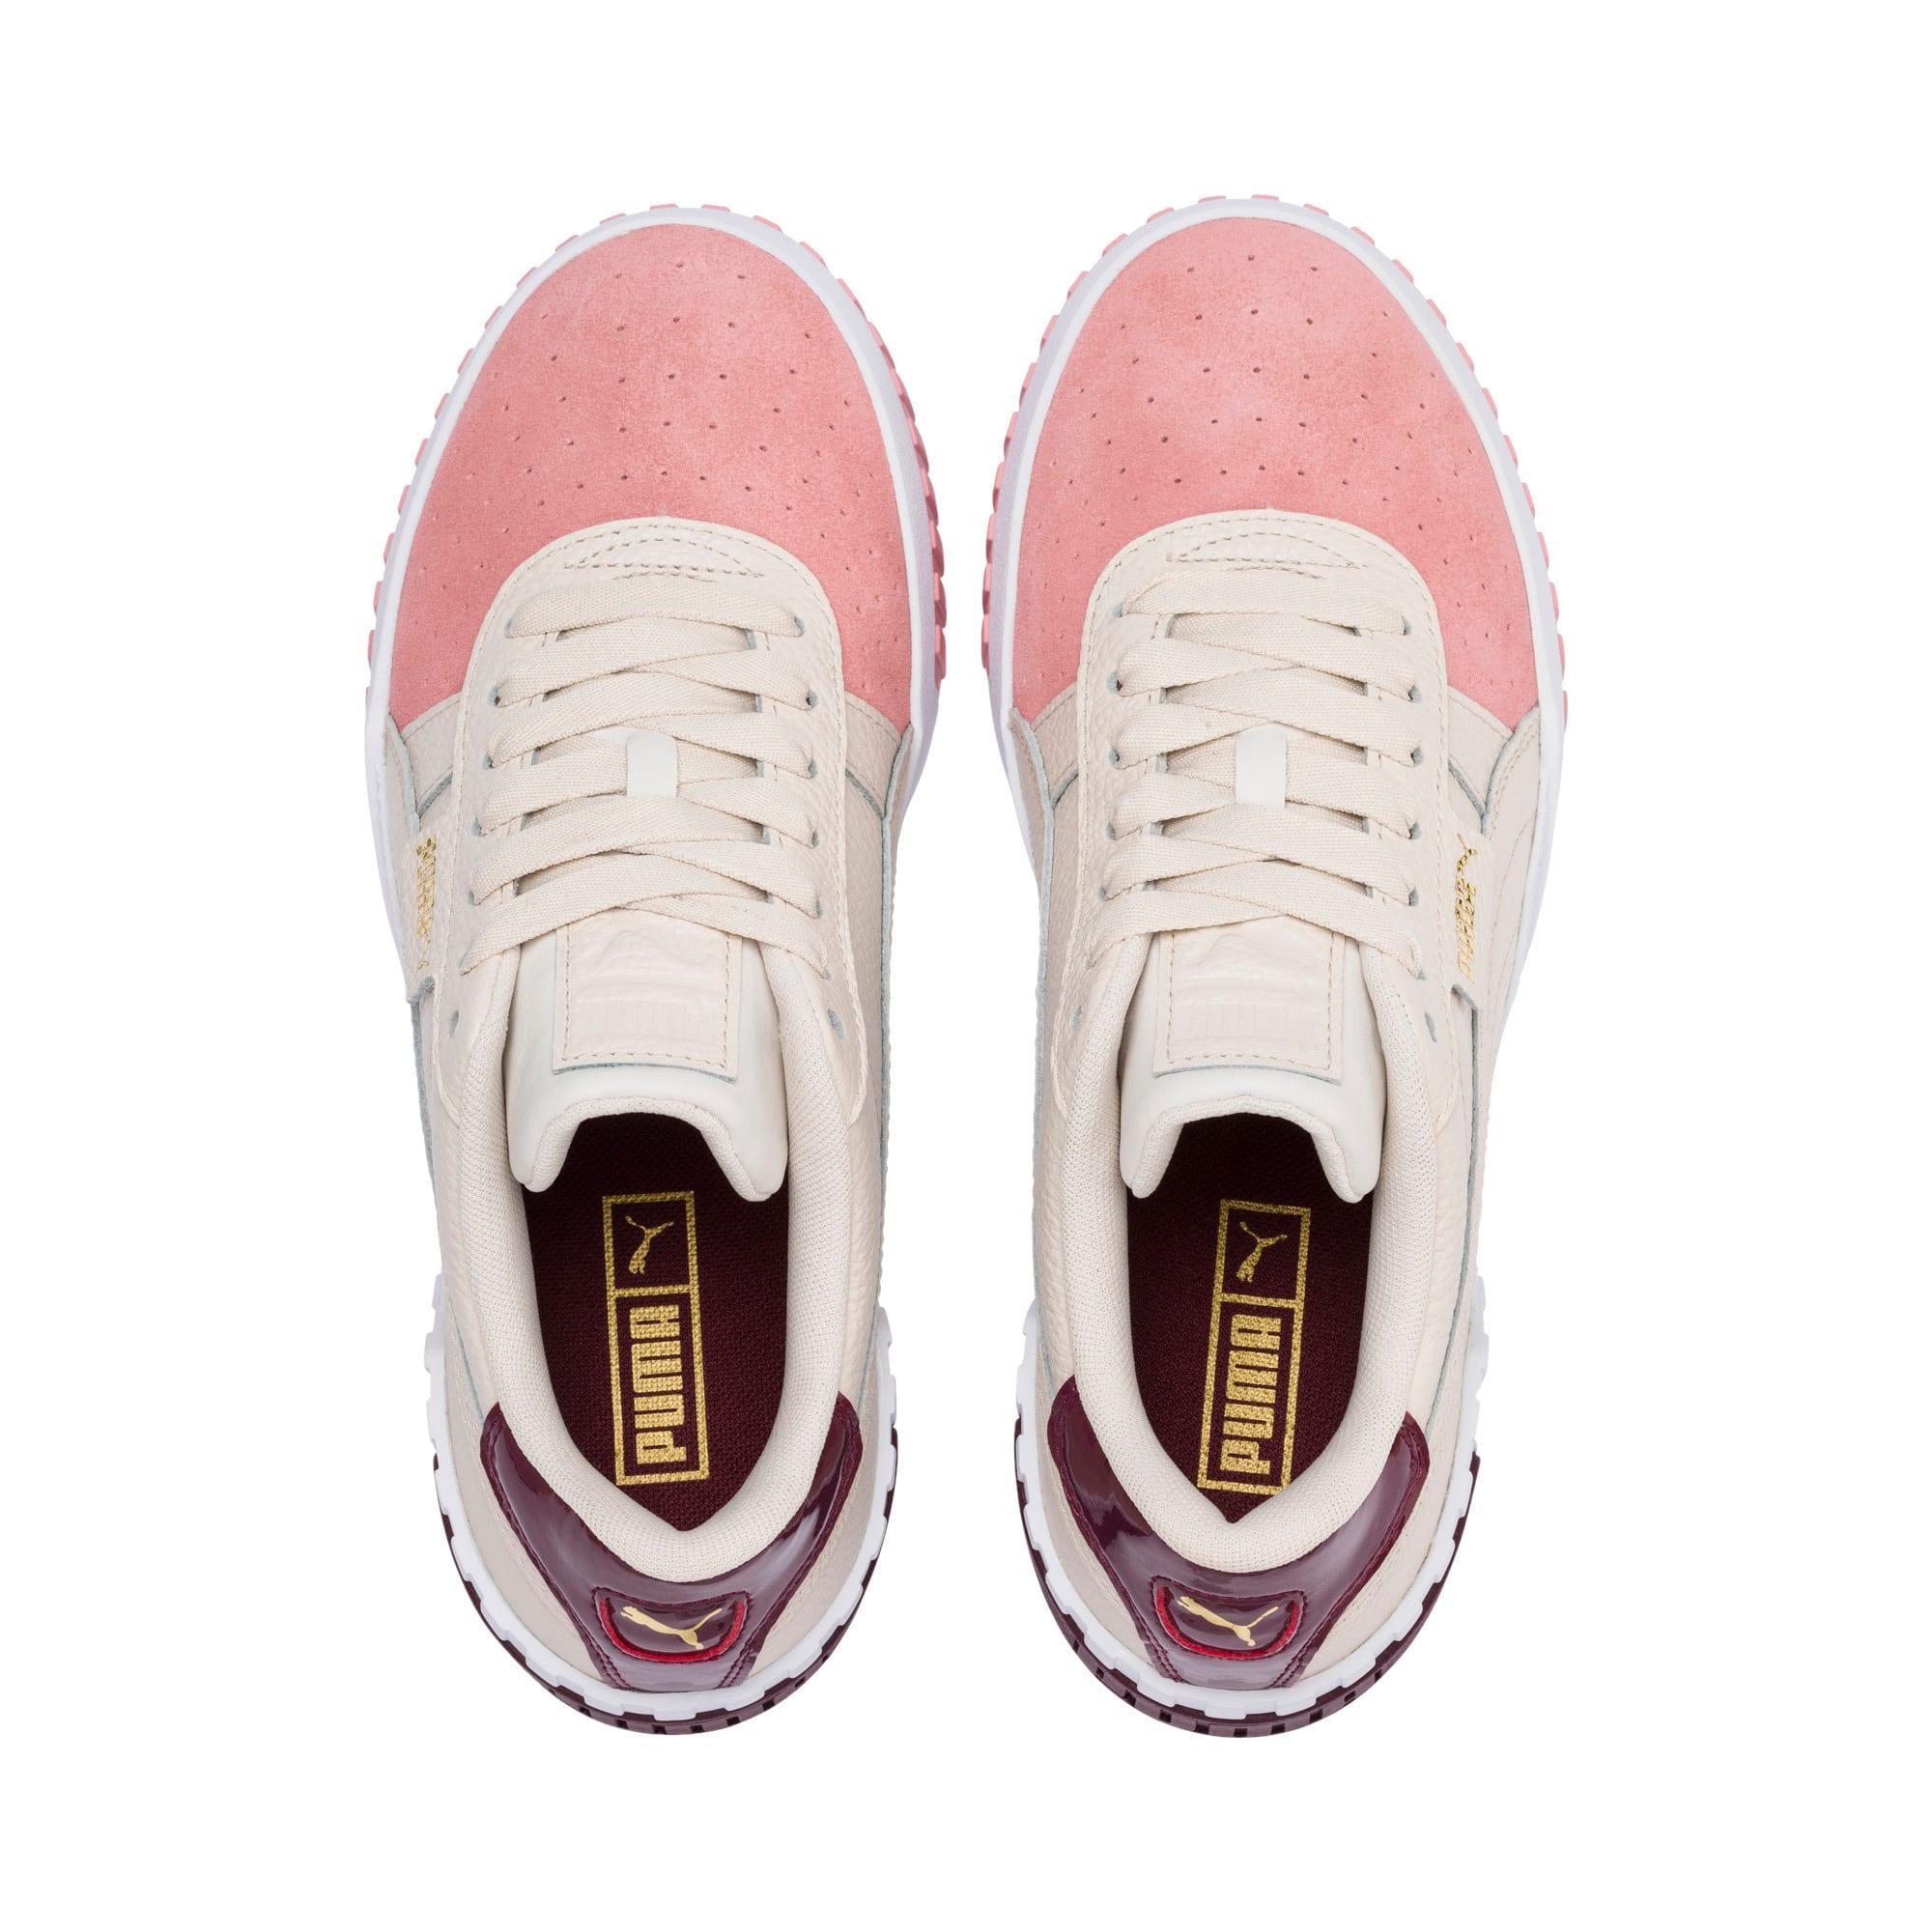 Thumbnail 7 of Cali Remix Women's Sneakers, Pastel Parchment-Bridal Rose, medium